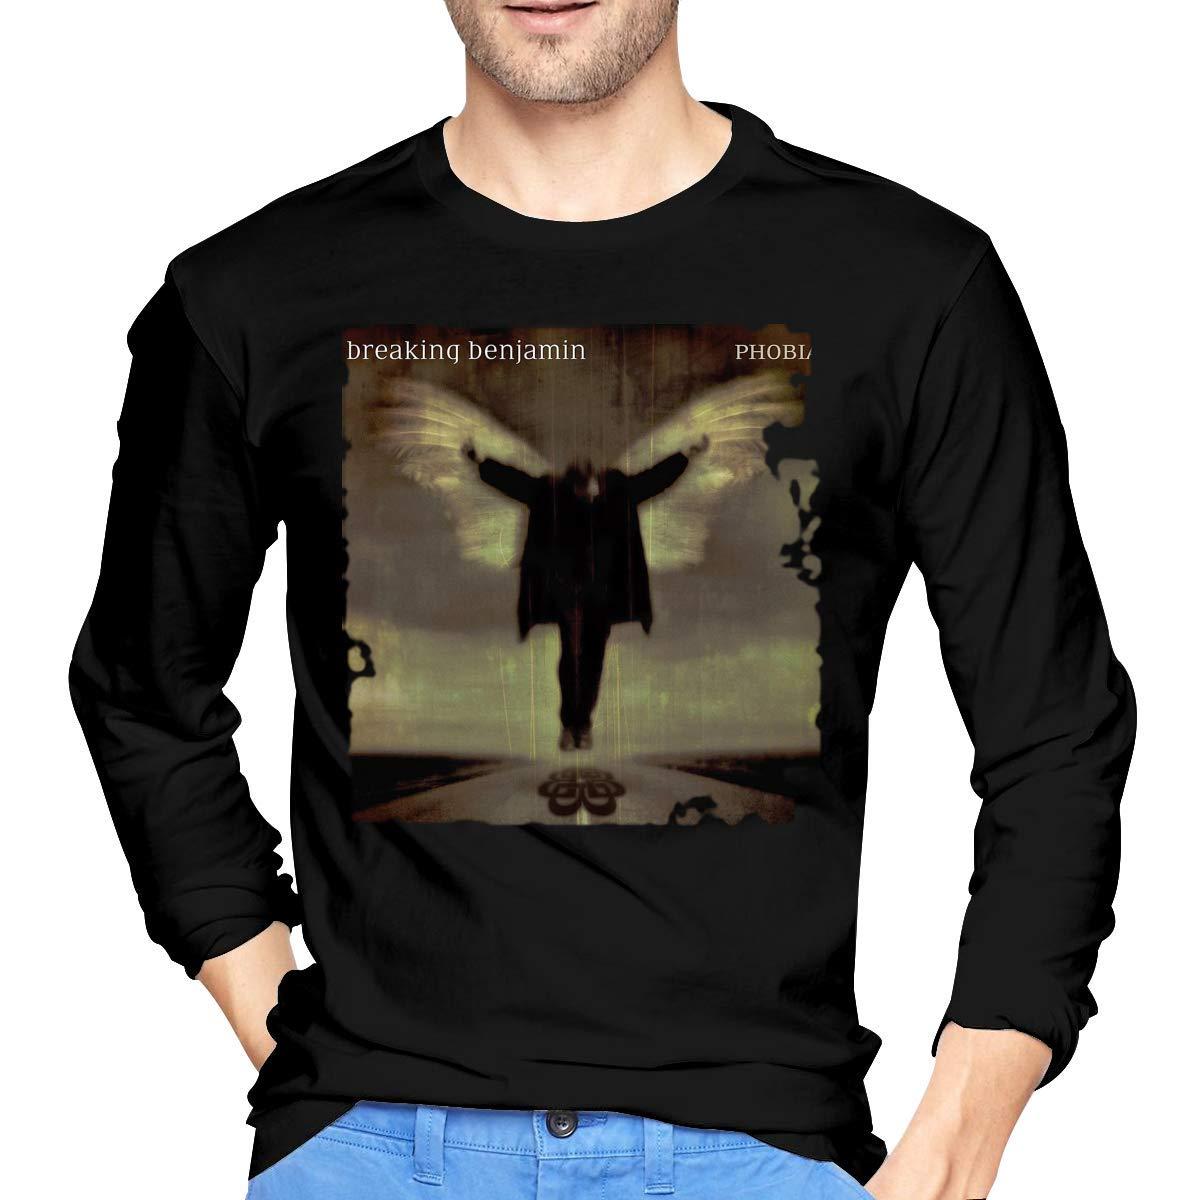 Fssatung S Breaking Benjamin Phobia T Shirts Black